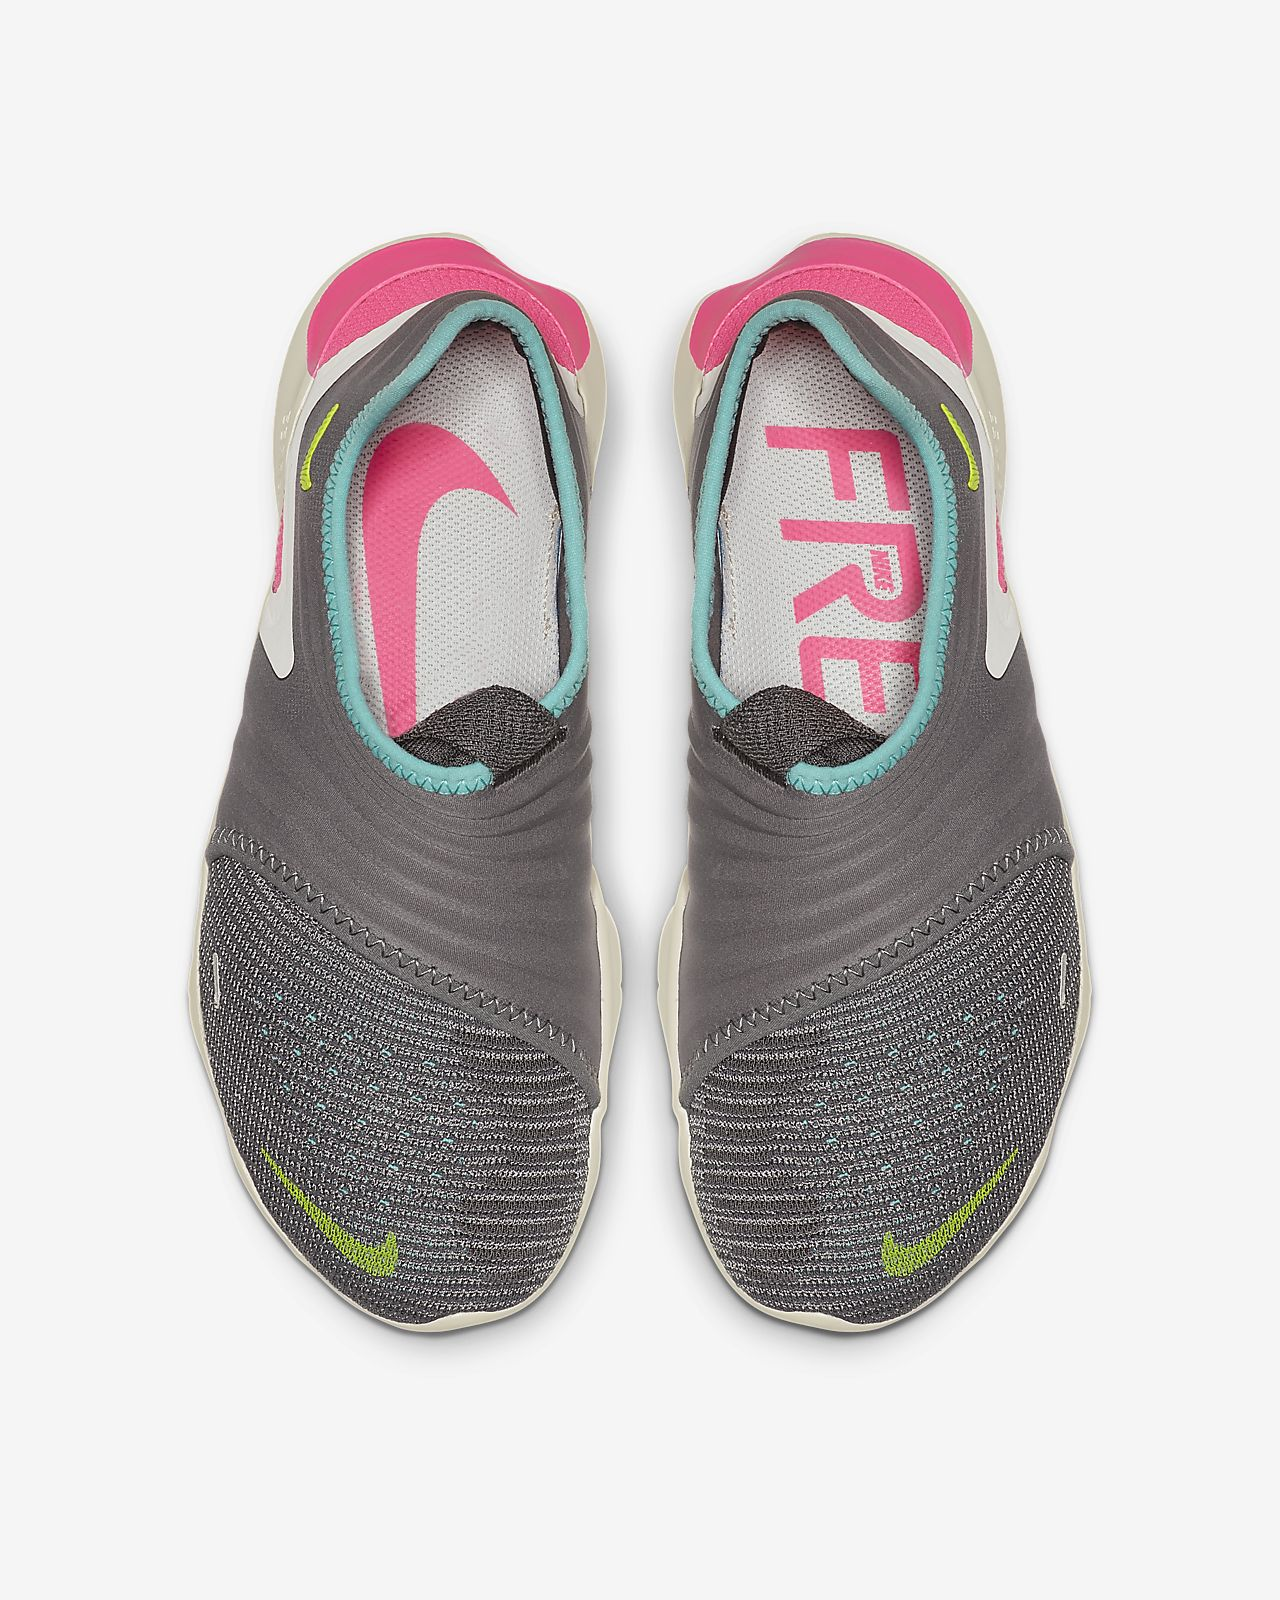 official photos b7fb9 1c0c6 ... Nike Free RN Flyknit 3.0 Women s Running Shoe